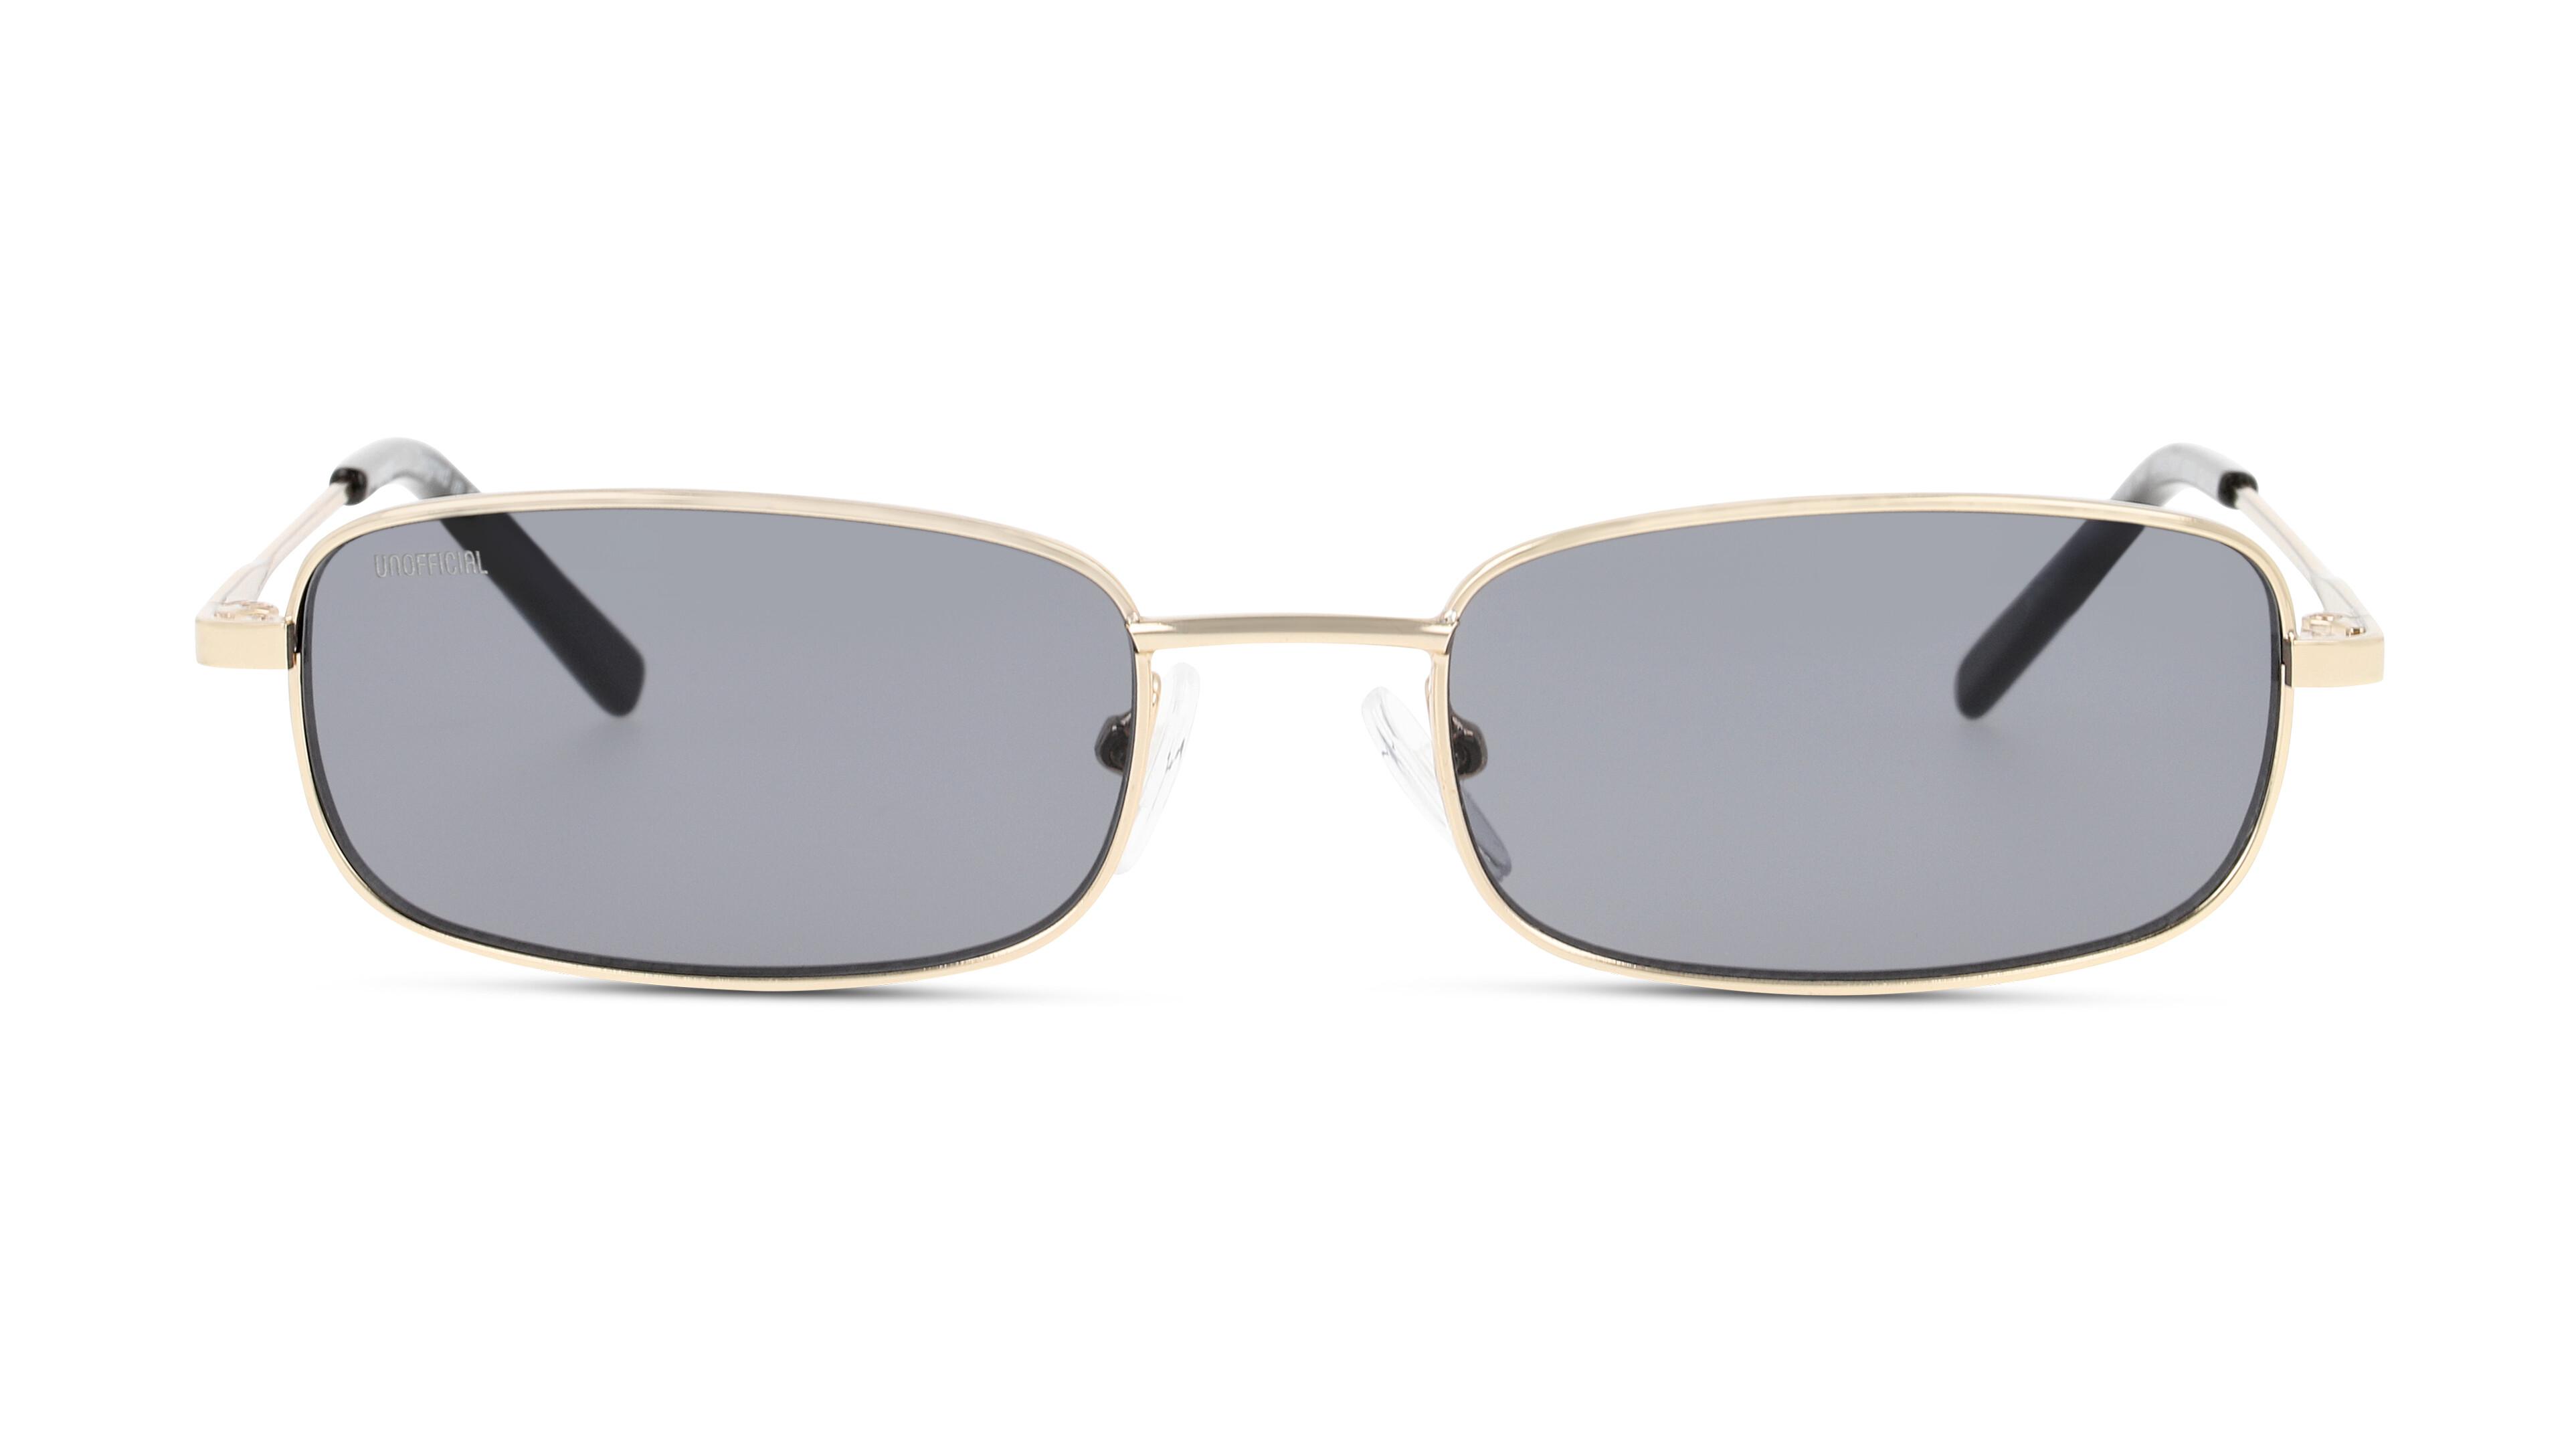 8719154814372-front-sonnenbrille-unofficial-unsu0087-gold-gold